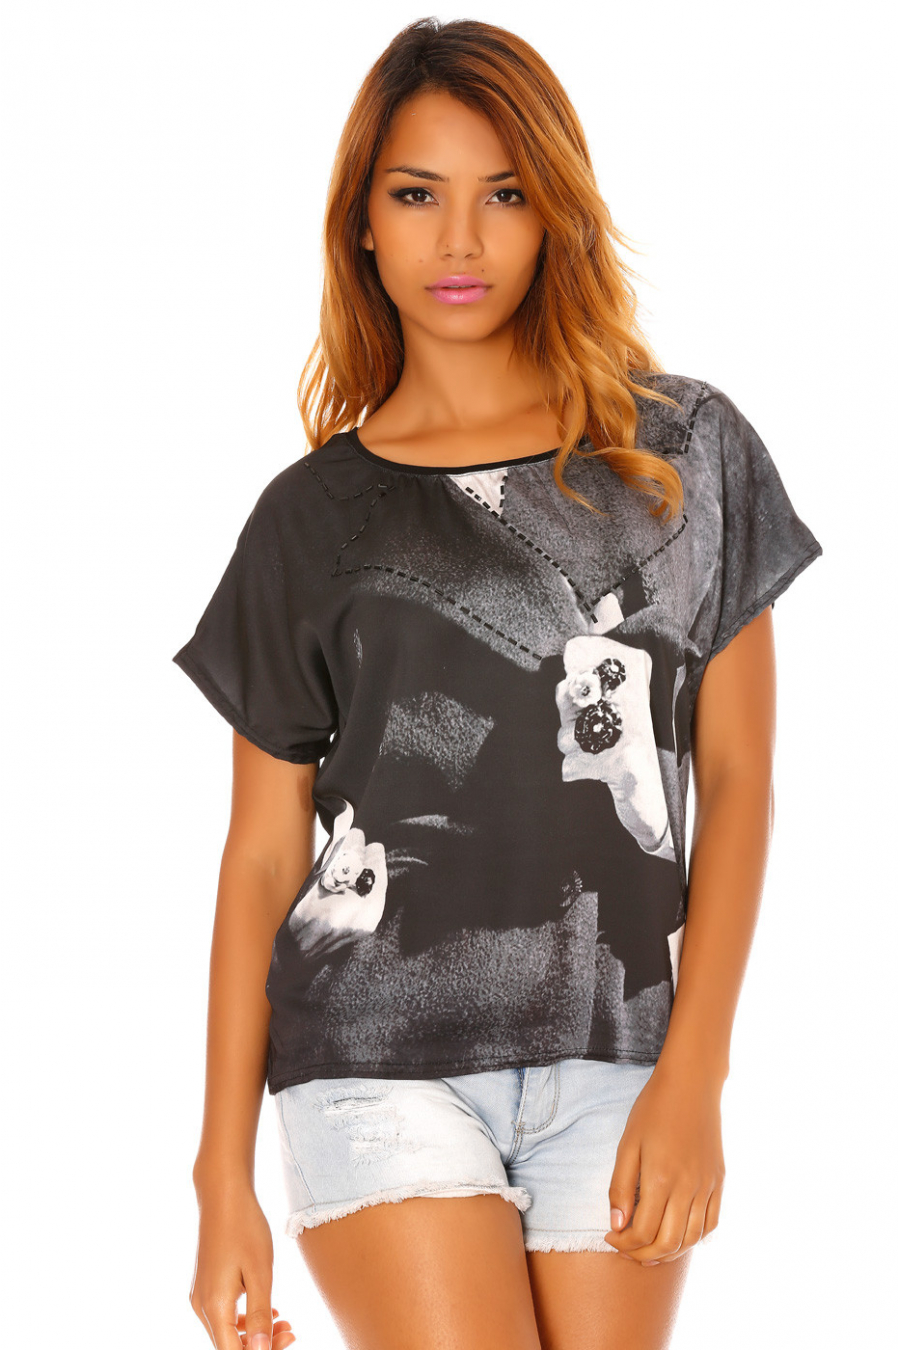 Satin black T-shirt printed with black rings and rhinestones. MC918